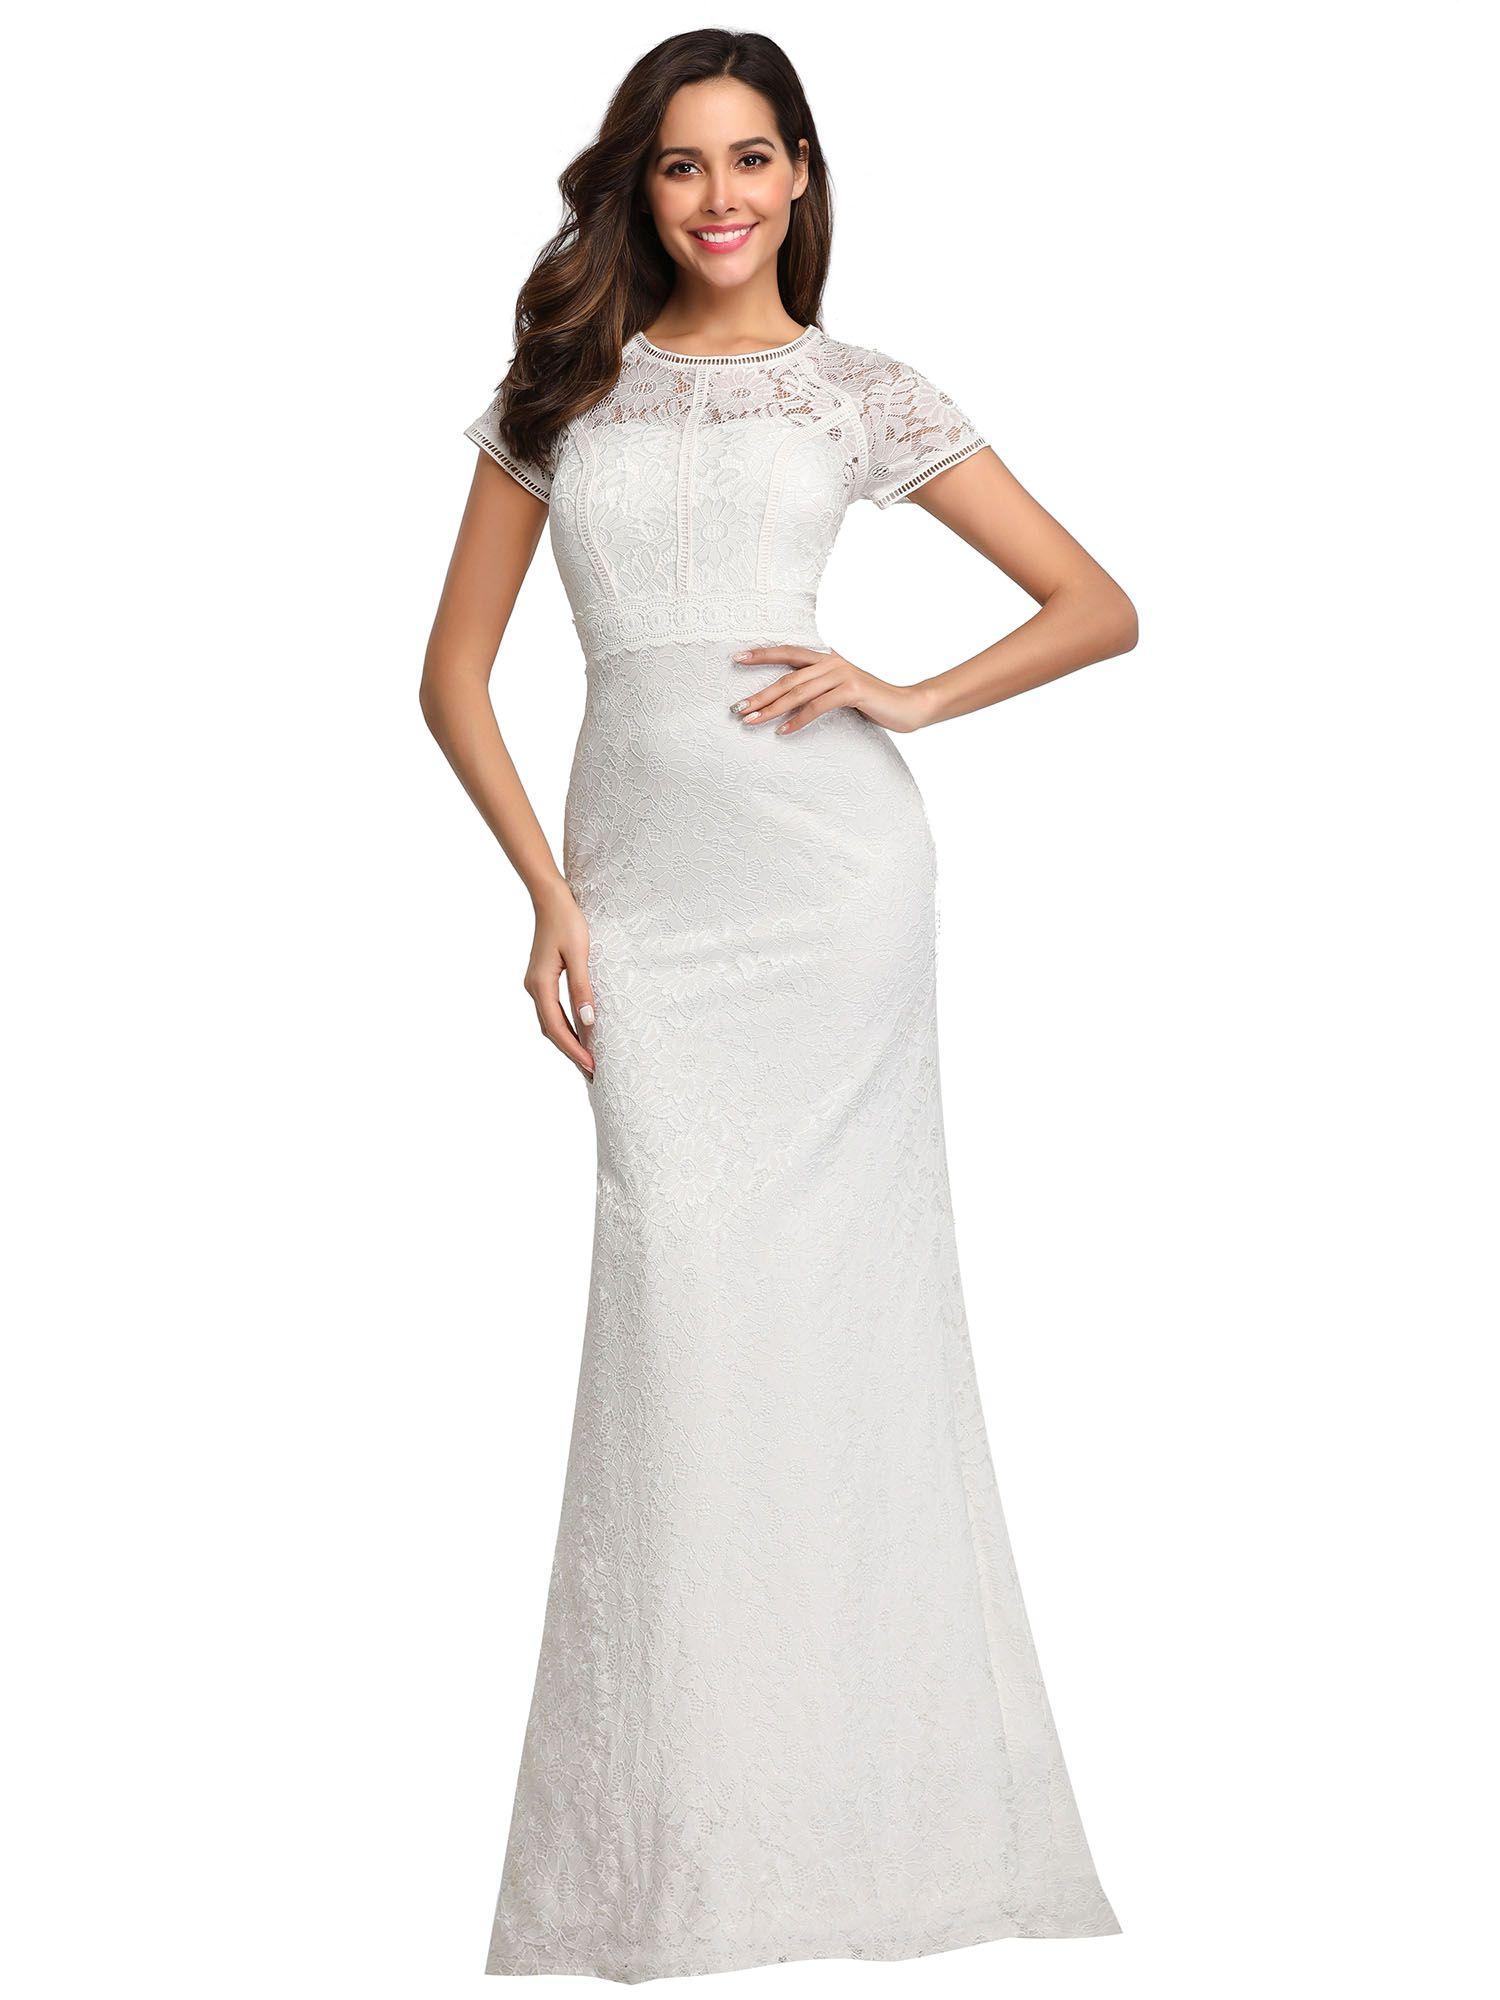 Ever Pretty Women S Illusive Back Lace Prom Dresses For Women 07802 Us8 Ad Illusive Affiliate Lace Lace Dress Long Evening Dresses Evening Dresses Long [ 2000 x 1500 Pixel ]